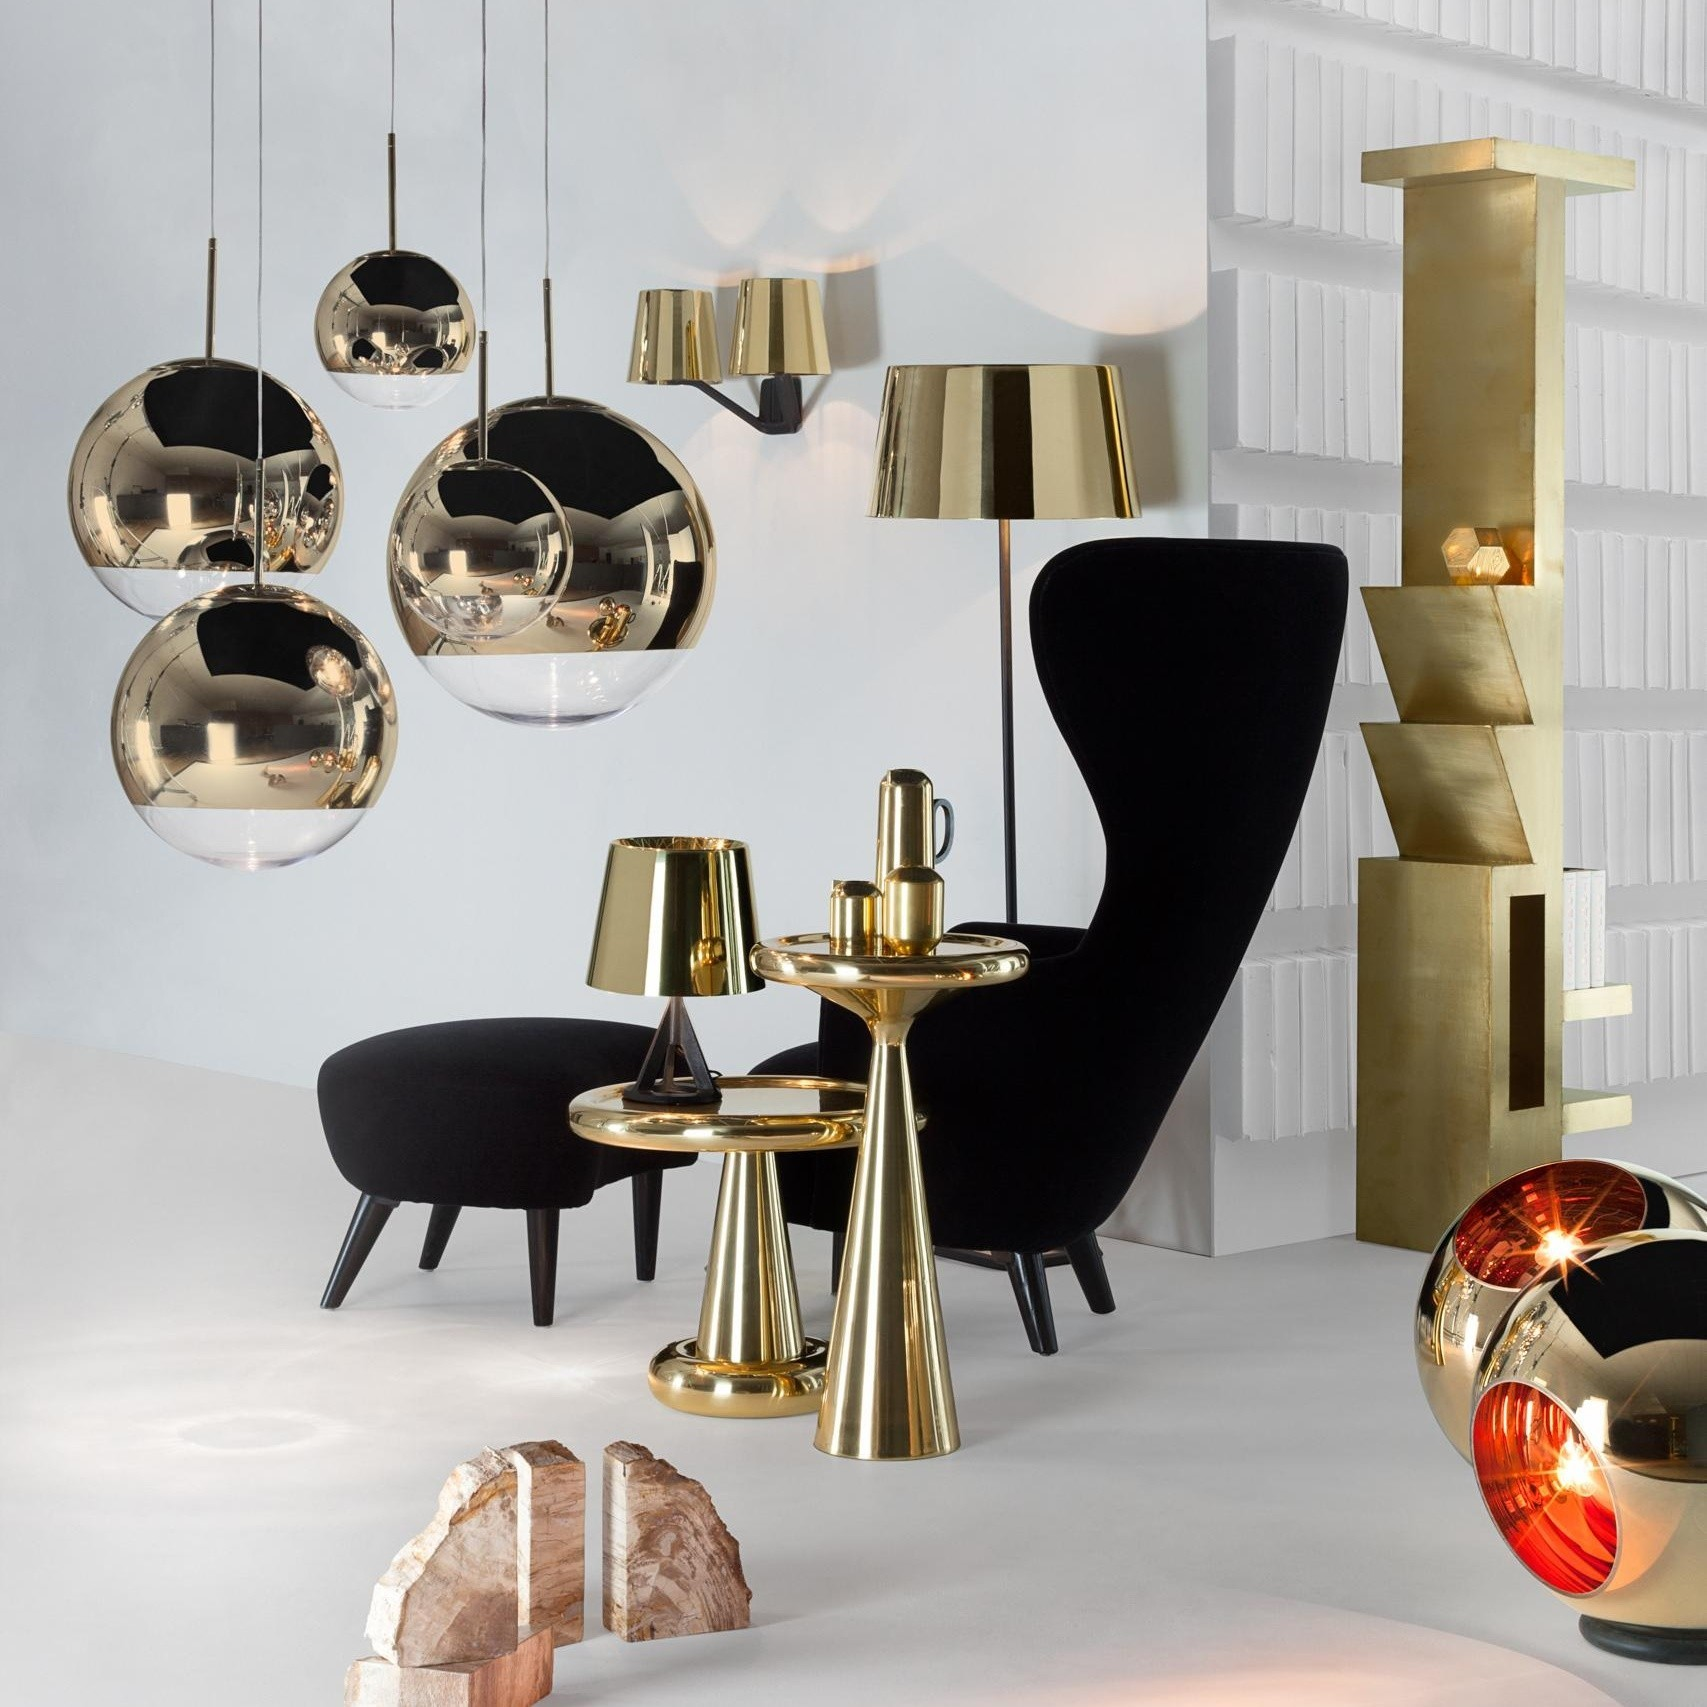 Tom Dixon Mirror Ball Pendant Pendelleuchte Gold